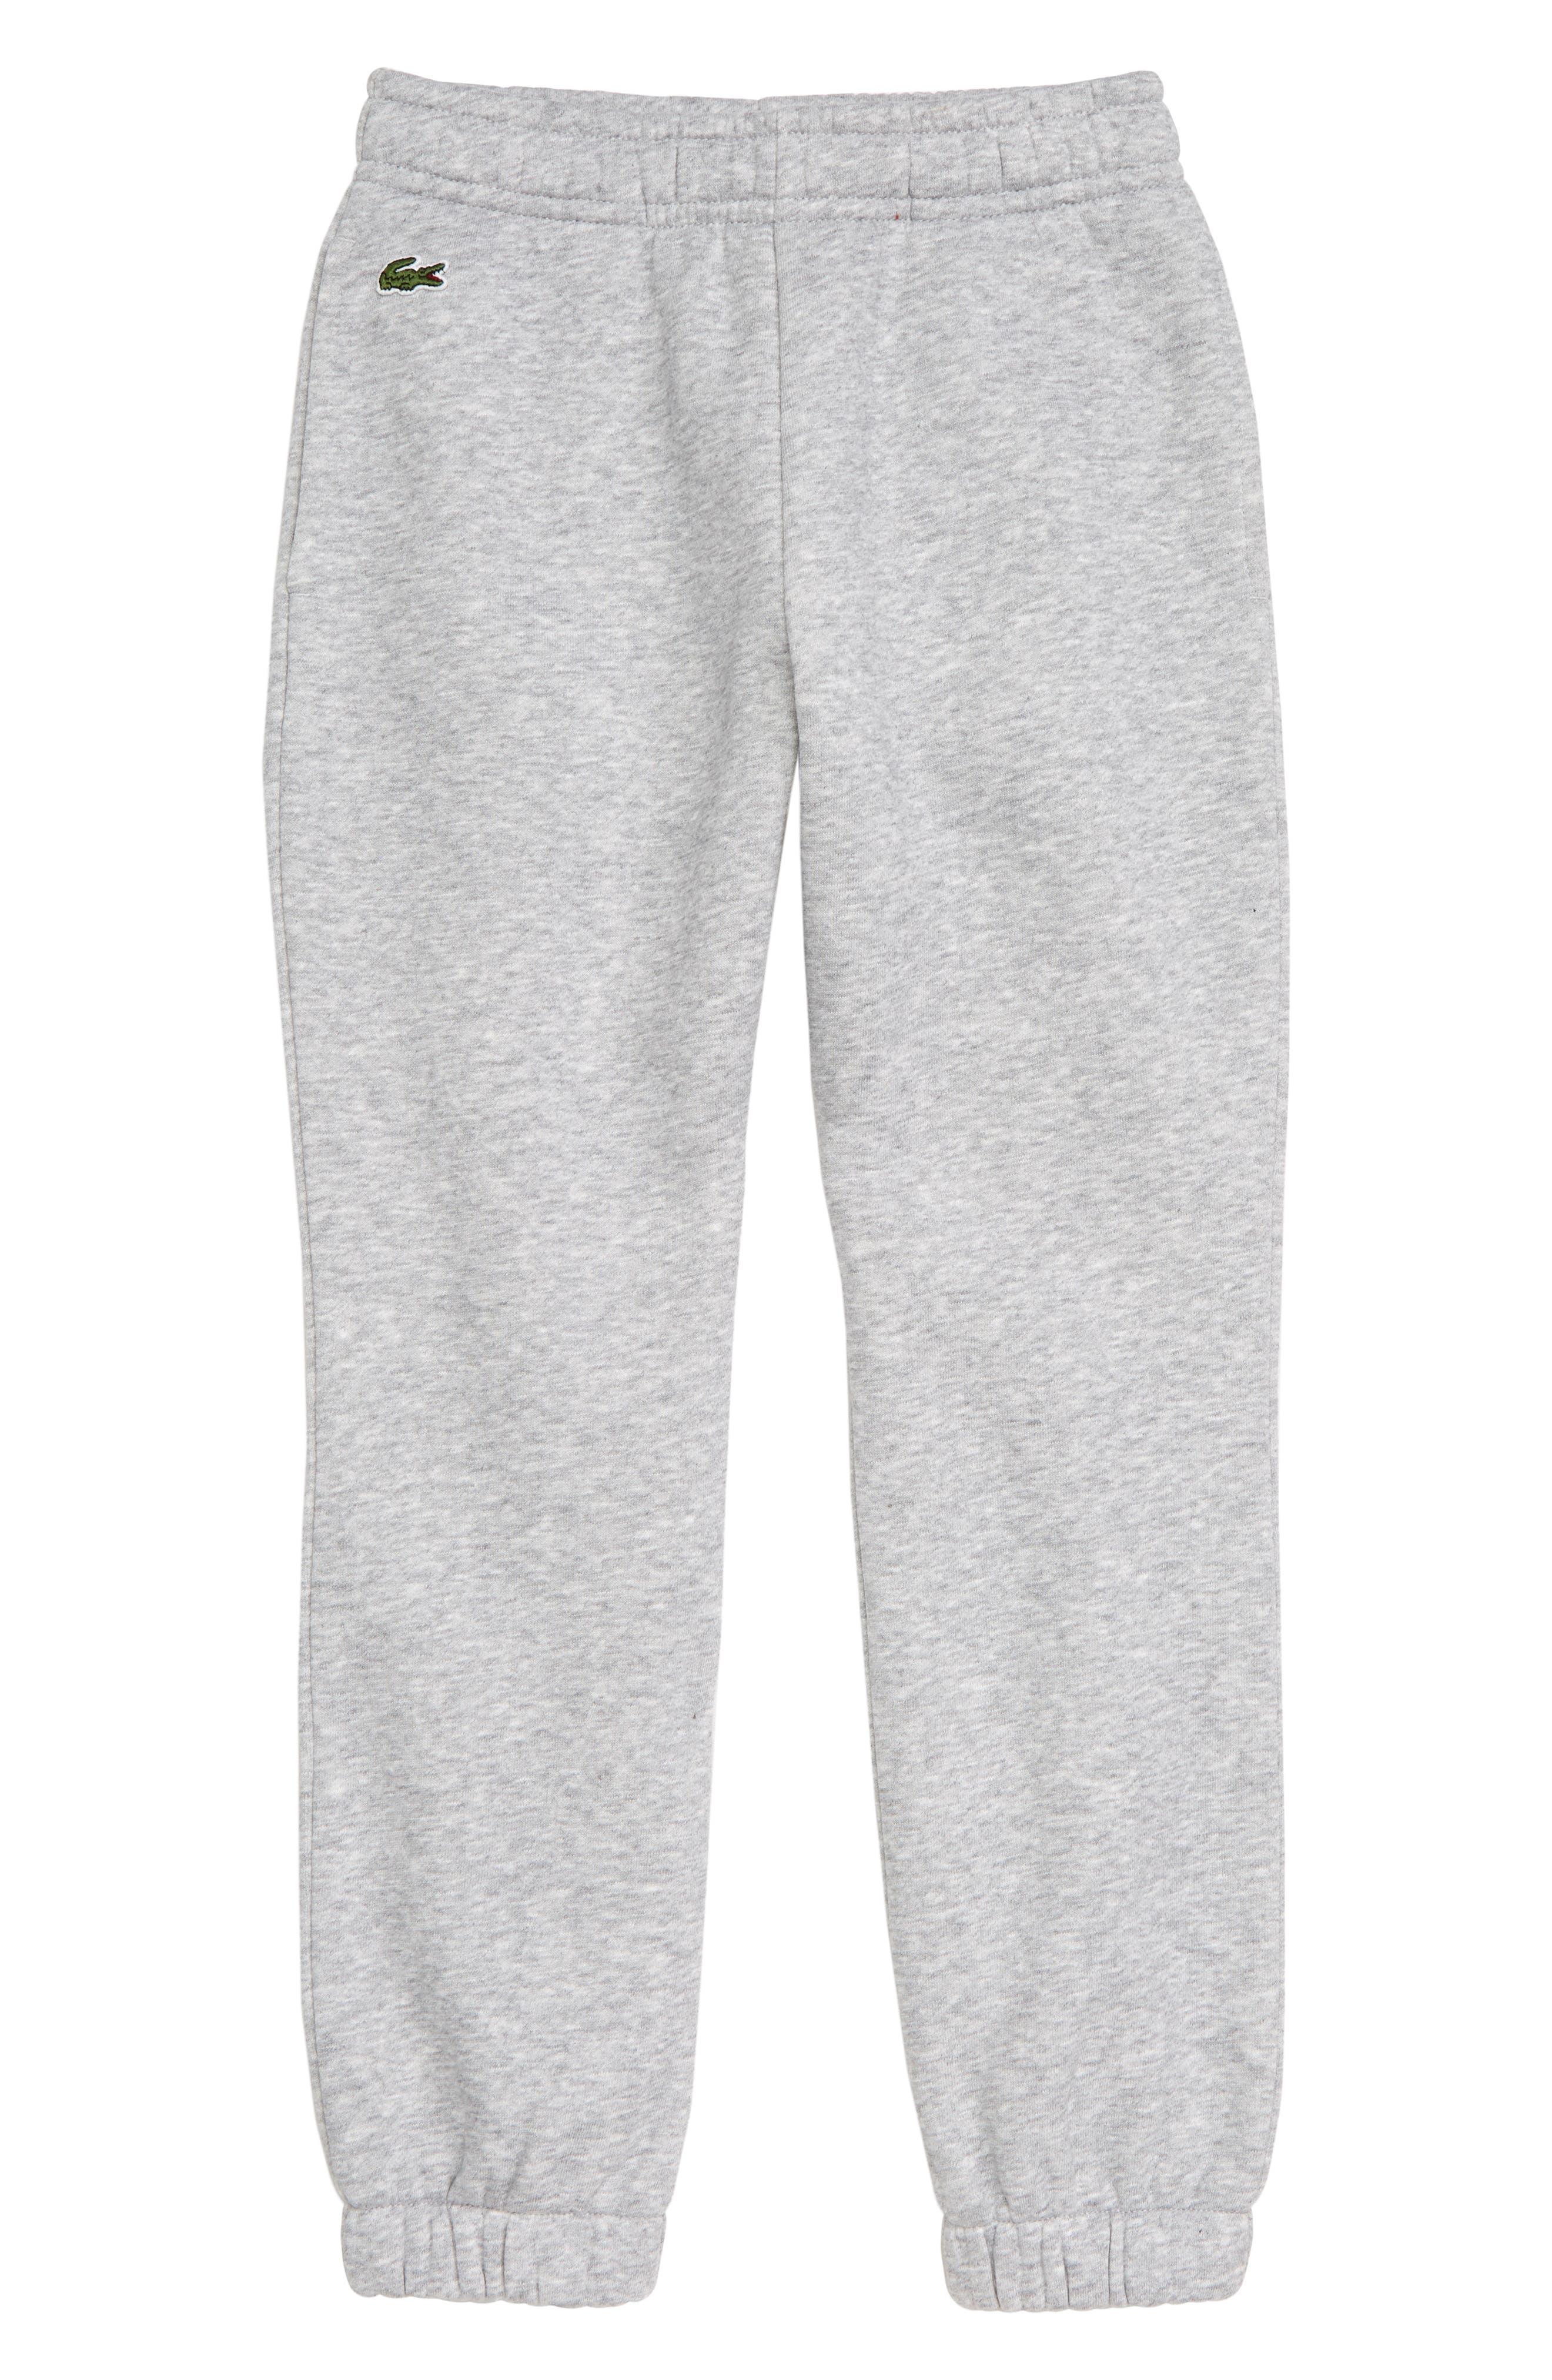 Fleece Pants,                             Main thumbnail 1, color,                             SILVER GREY